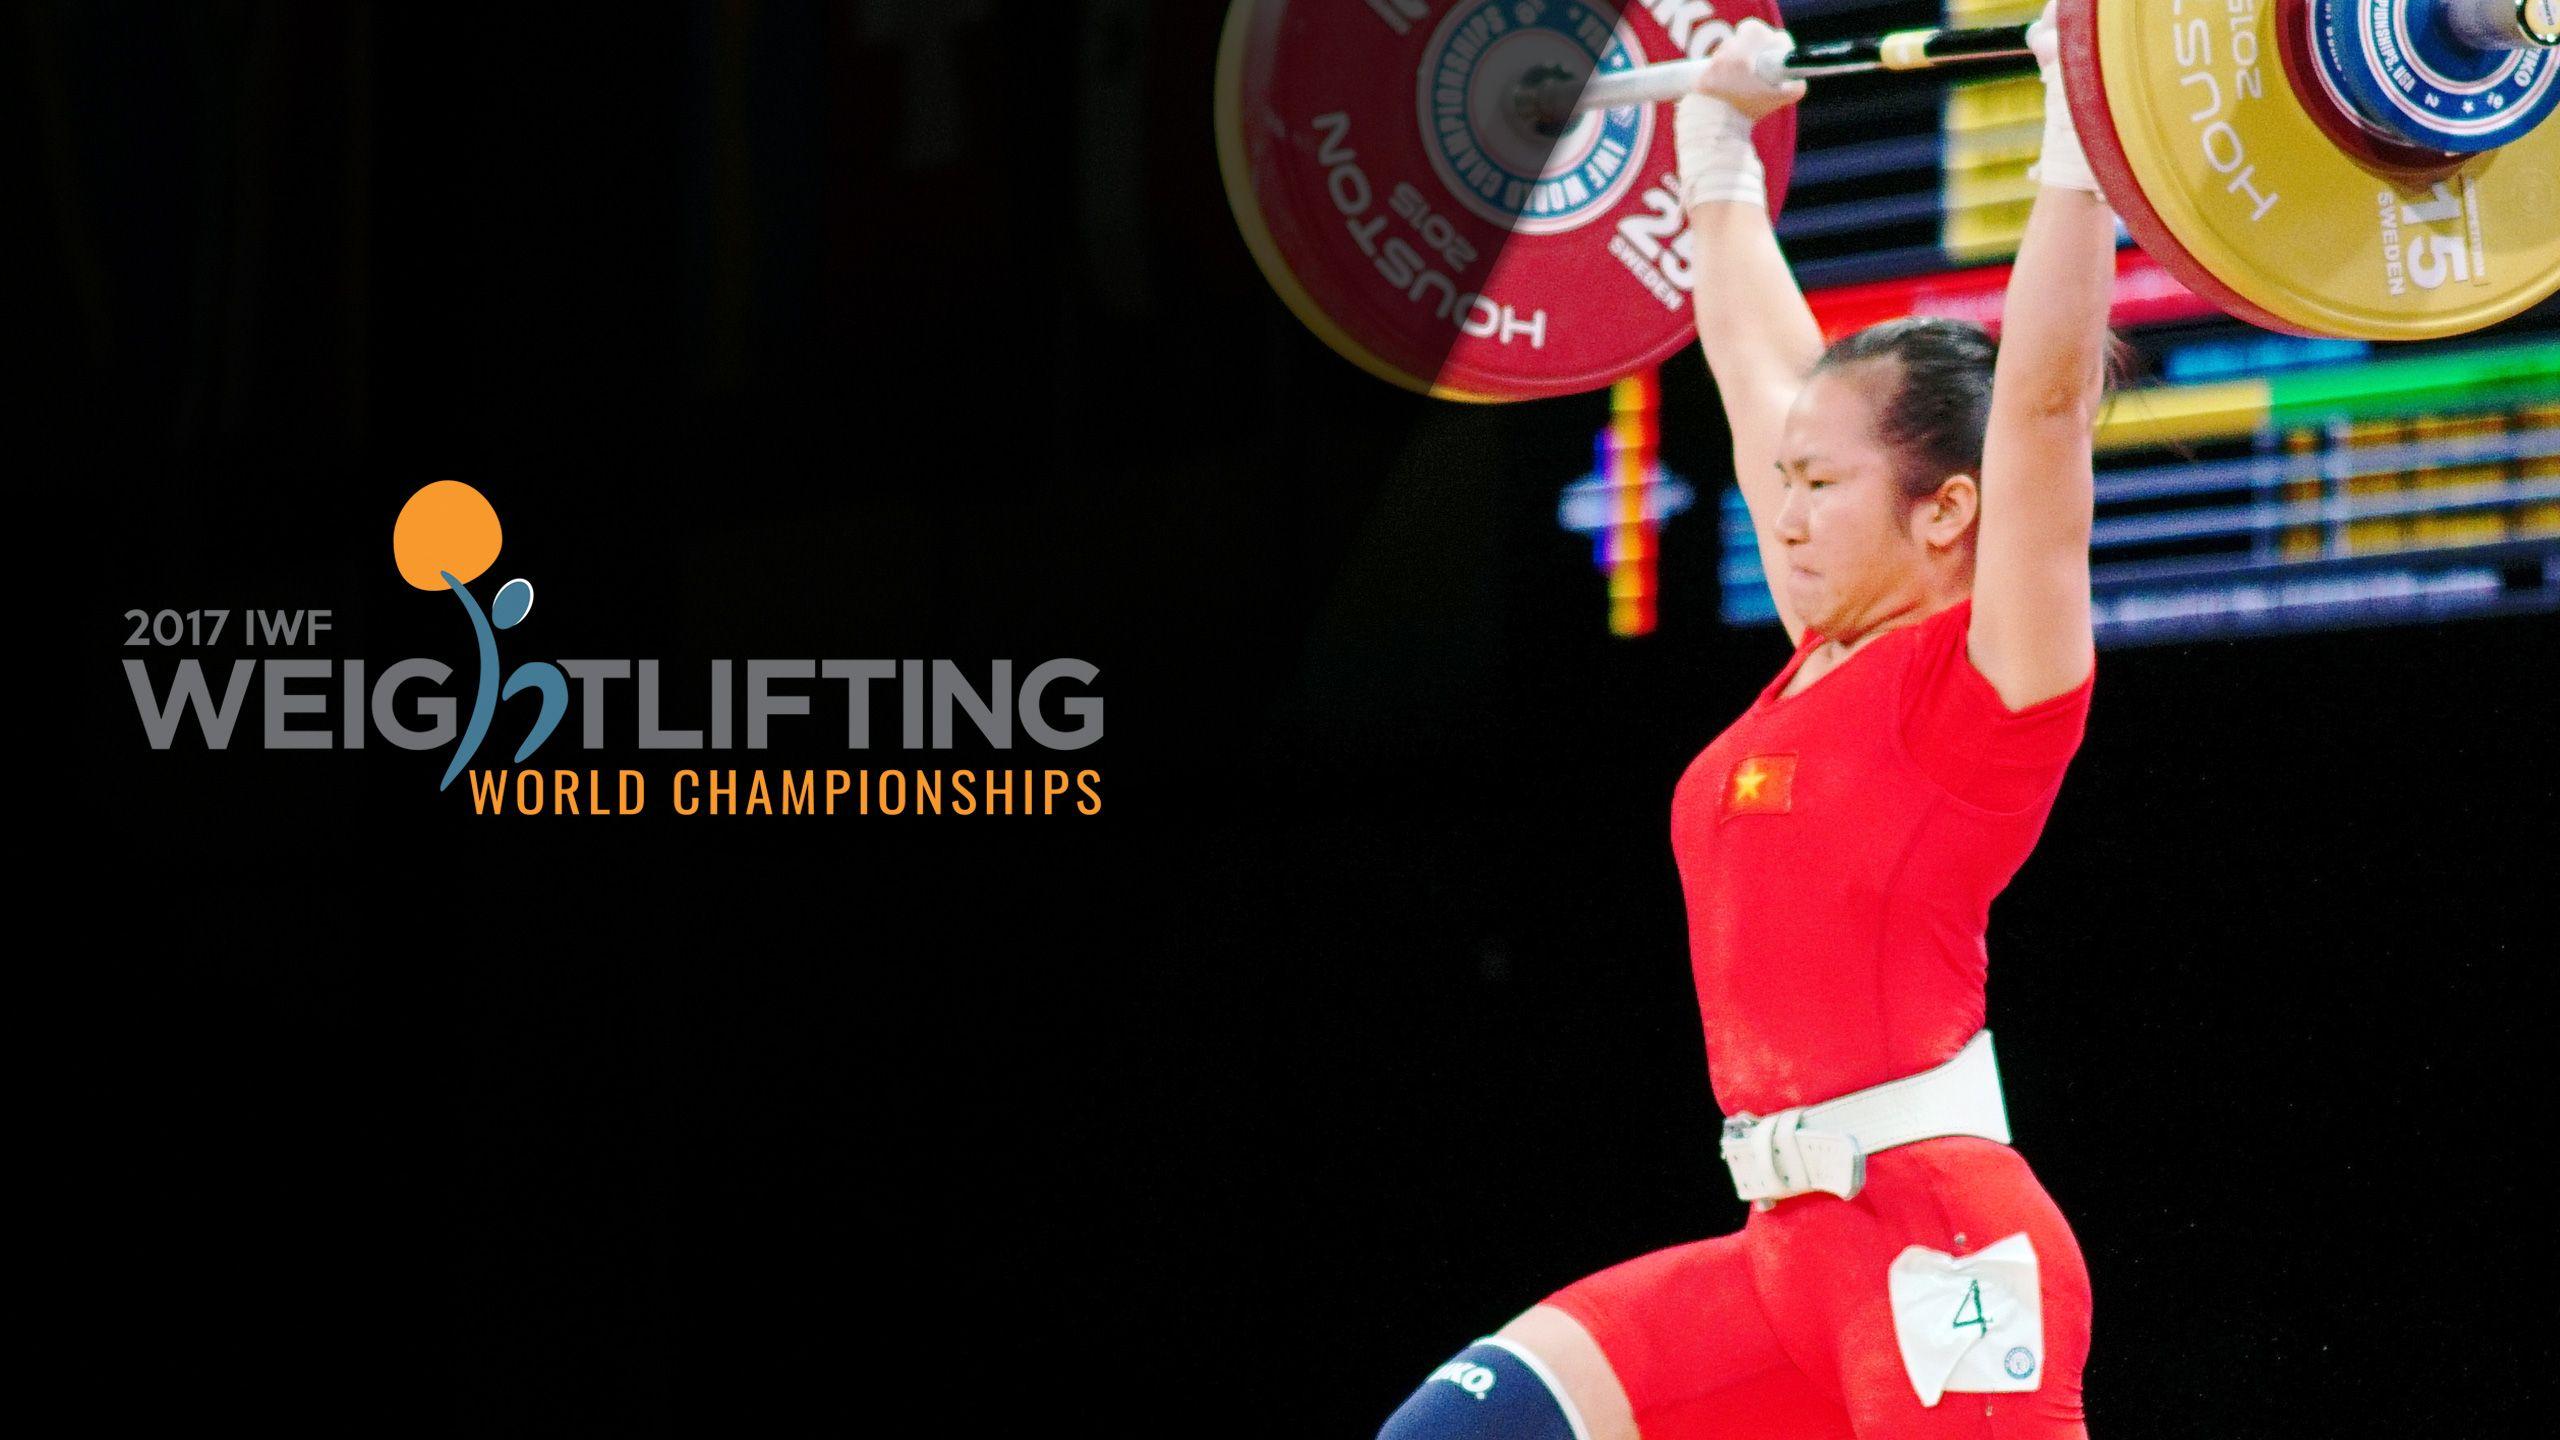 2017 IWF World Weightlifting Championships